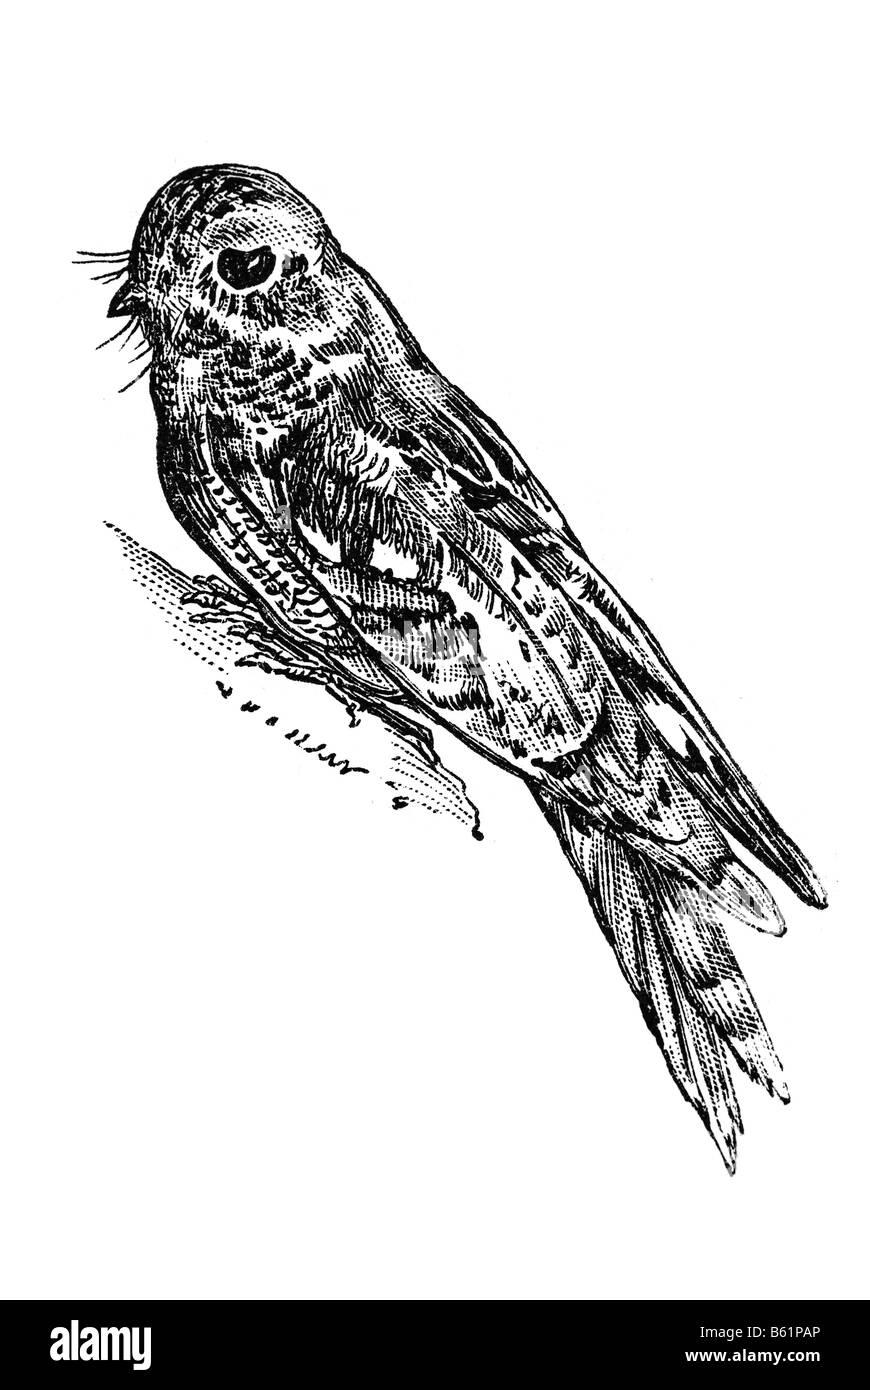 European Nightjar, or just Nightjar (Caprimulgus europaeus) - Stock Image